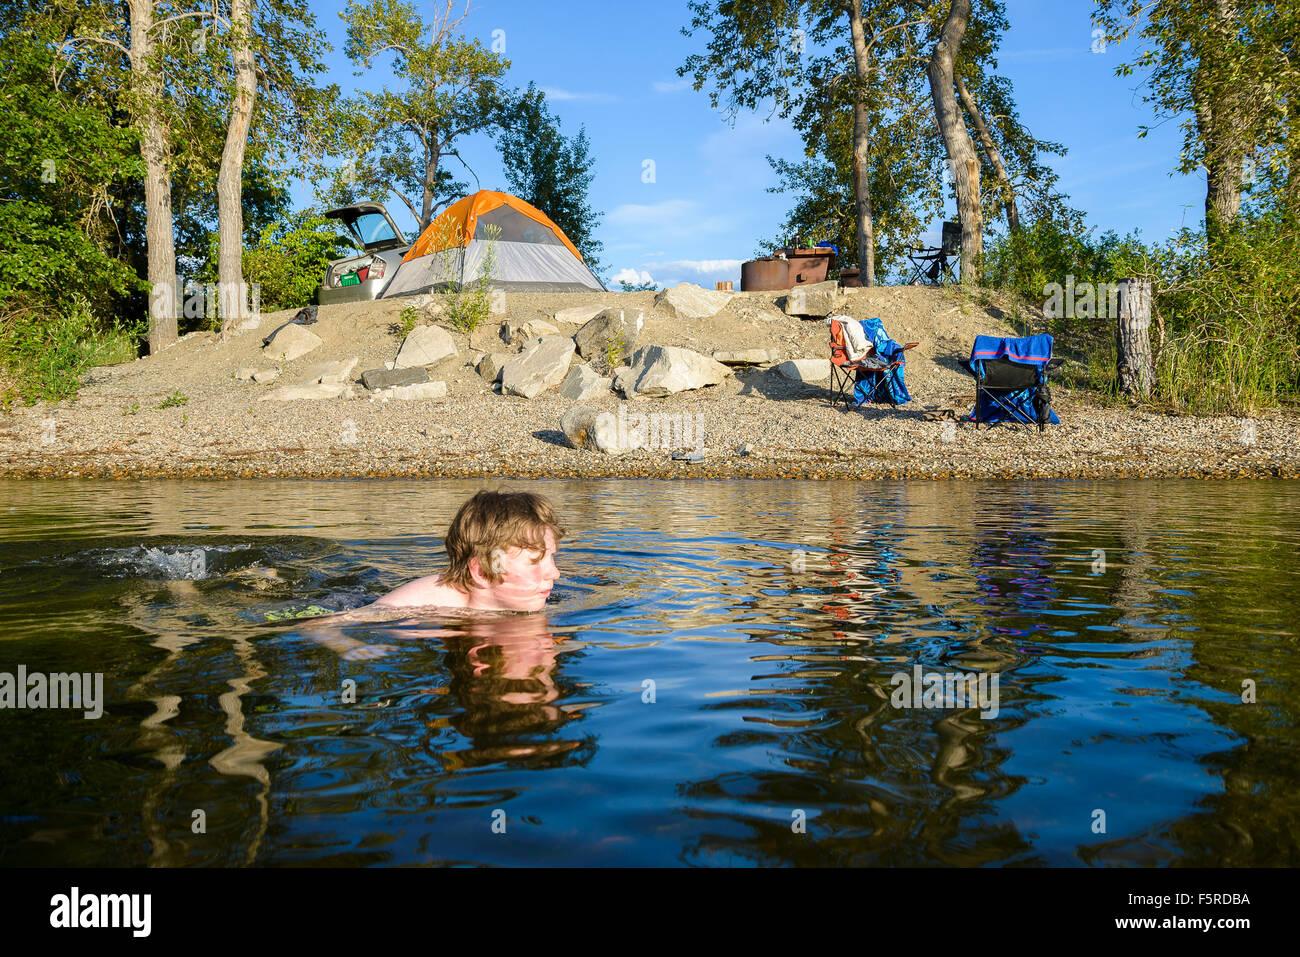 Boy swims in water at lake shore campsite,sẁiẁs Provincial Park, Osoyoos, British Columbia, Canada - Stock Image